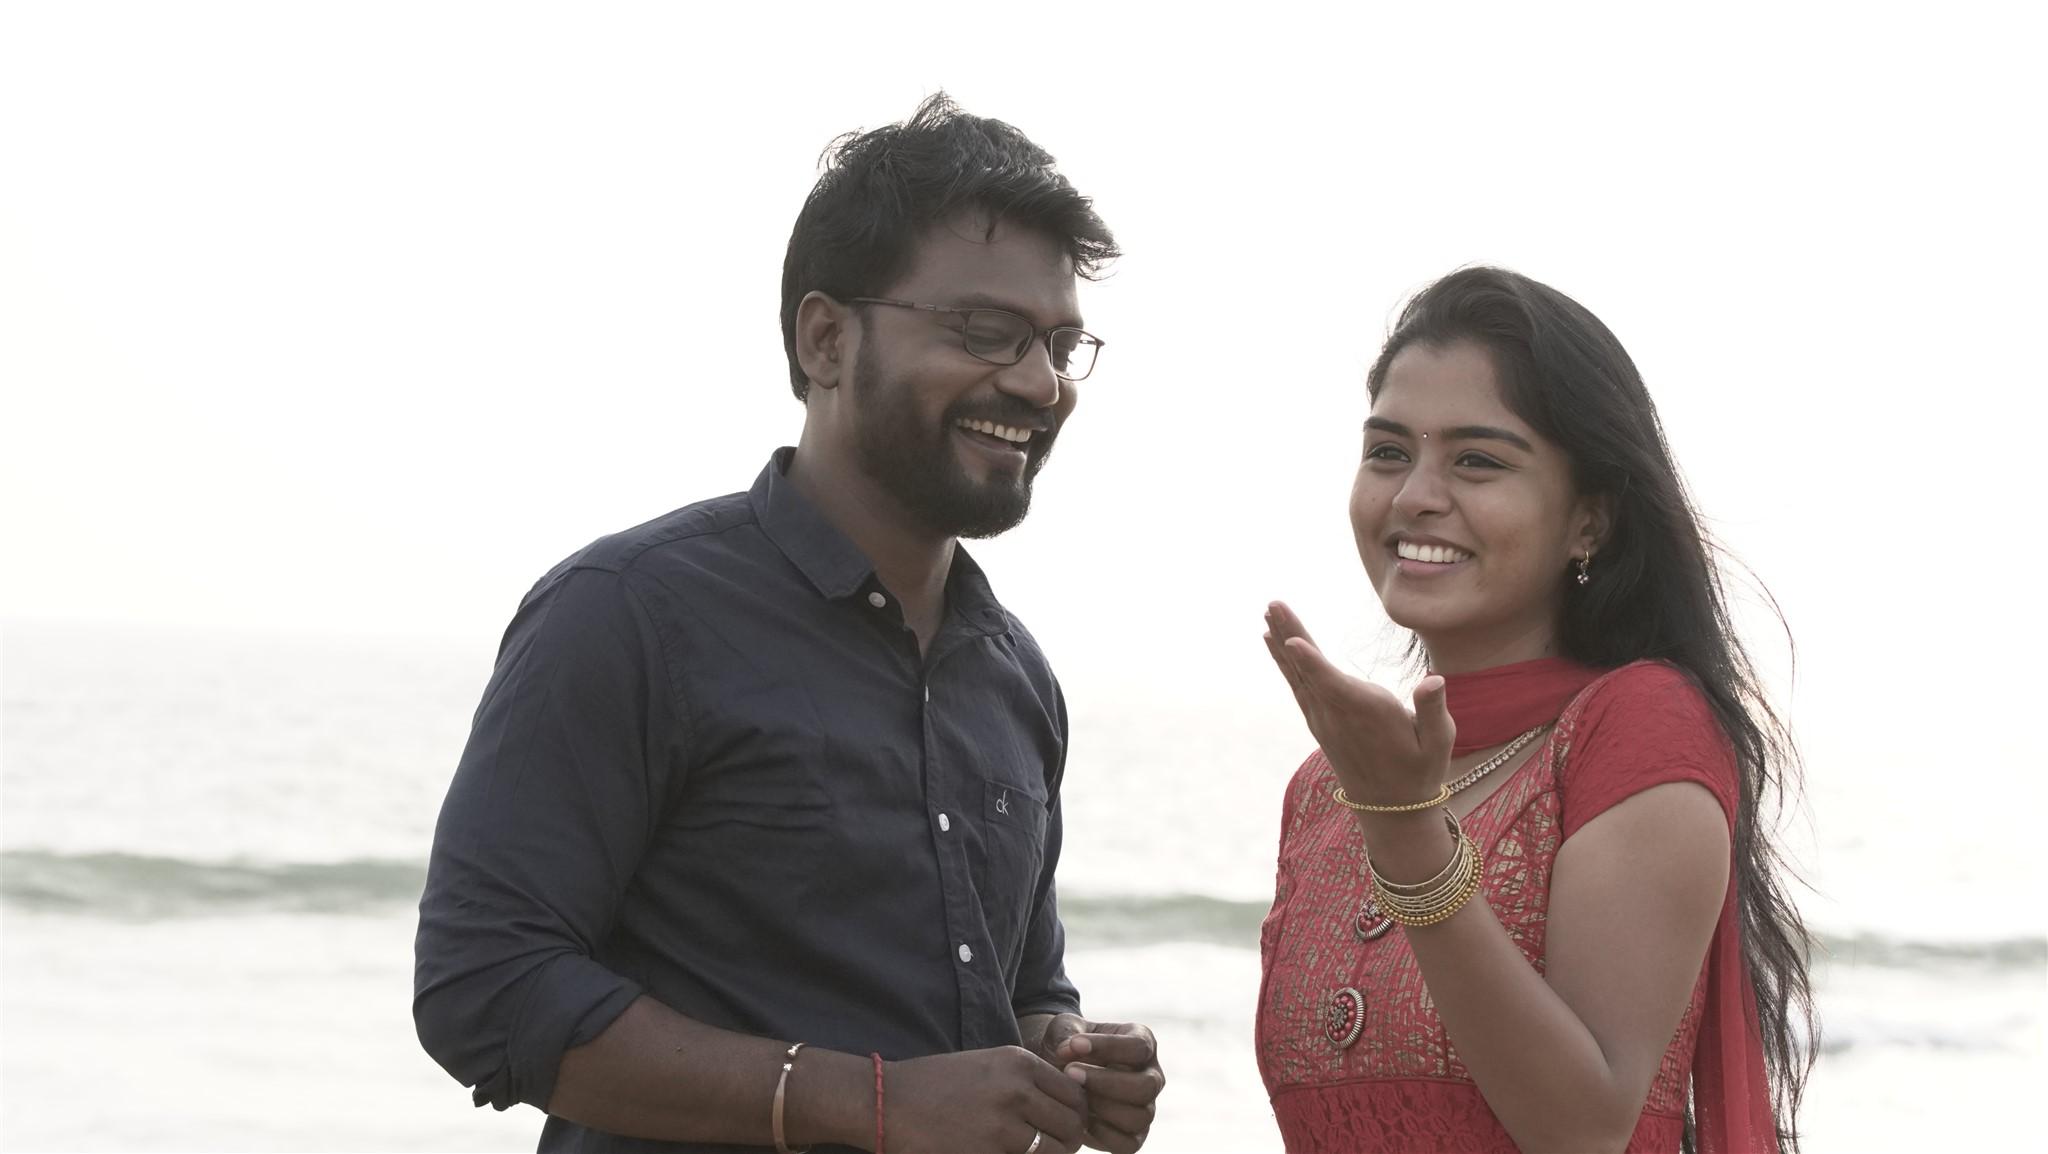 Masss Ravi, Lakshmi Priya Kaathu Vaakula Oru Kadhal Movie Pics